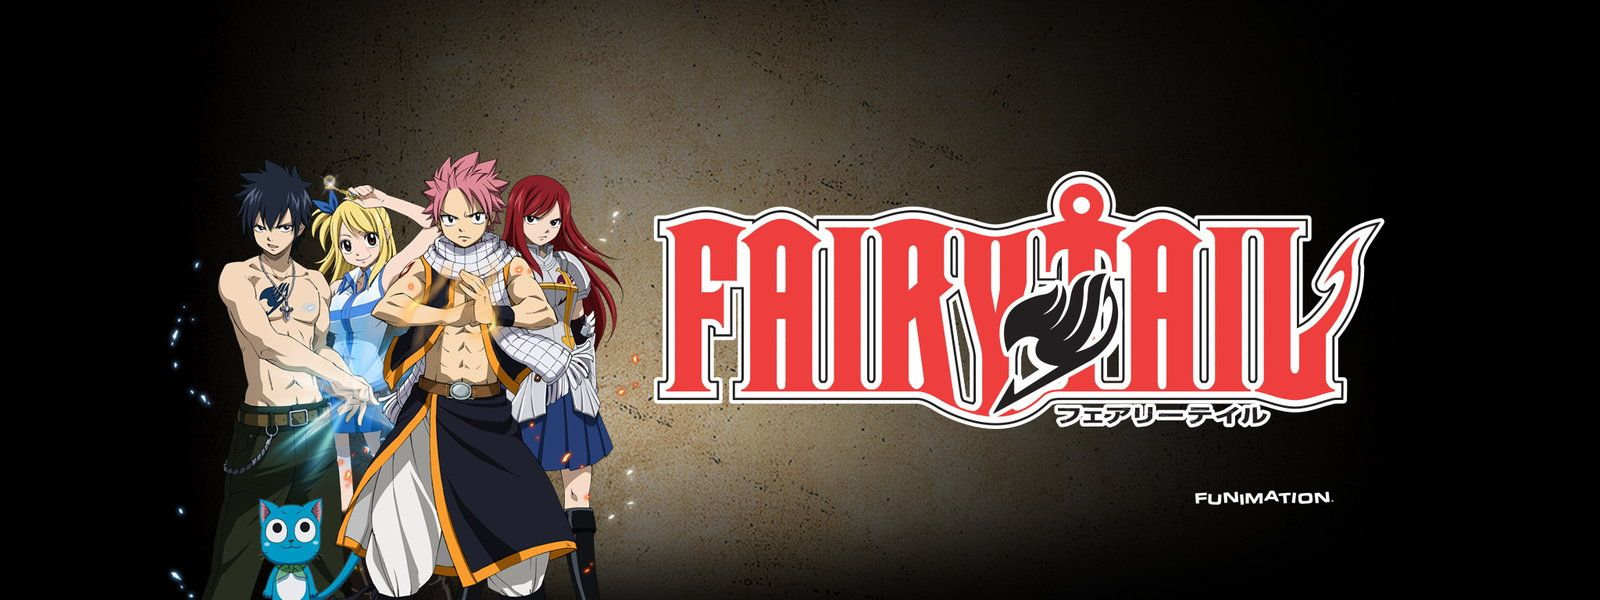 can watch on hulu or crunchyroll ) Watch fairy tail